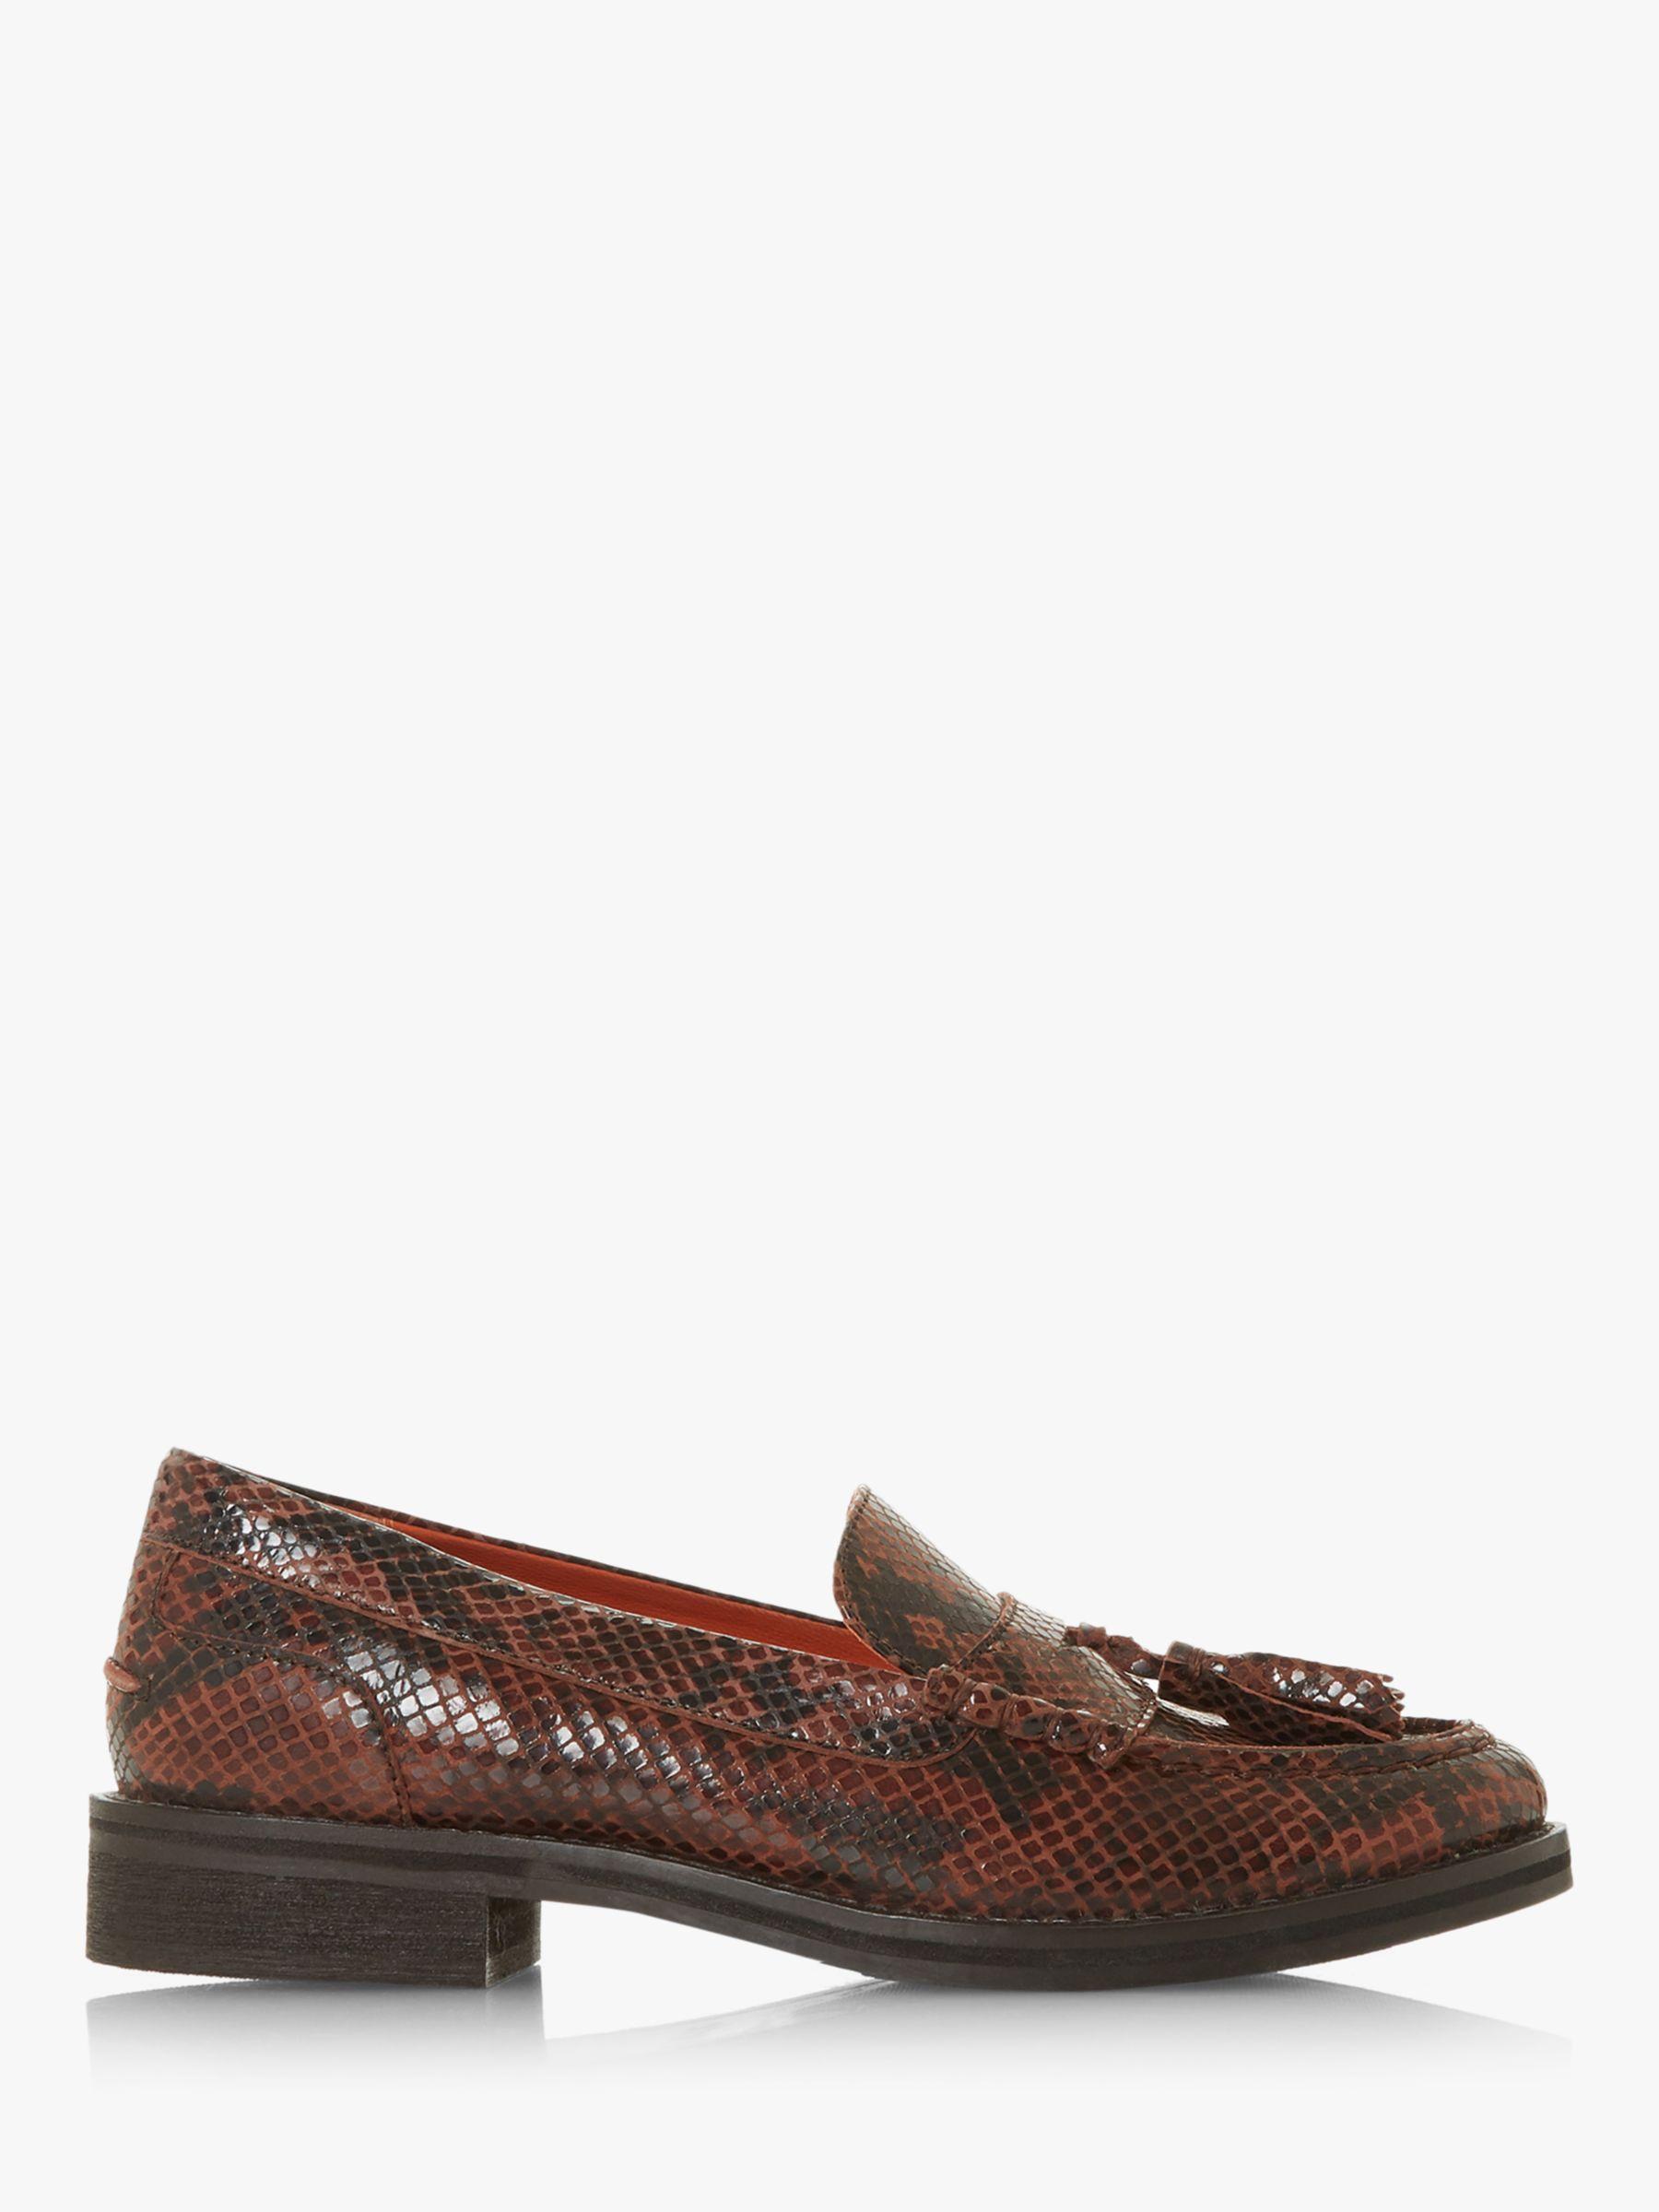 Bertie Bertie Giorgeo Leather Tasselled Loafers